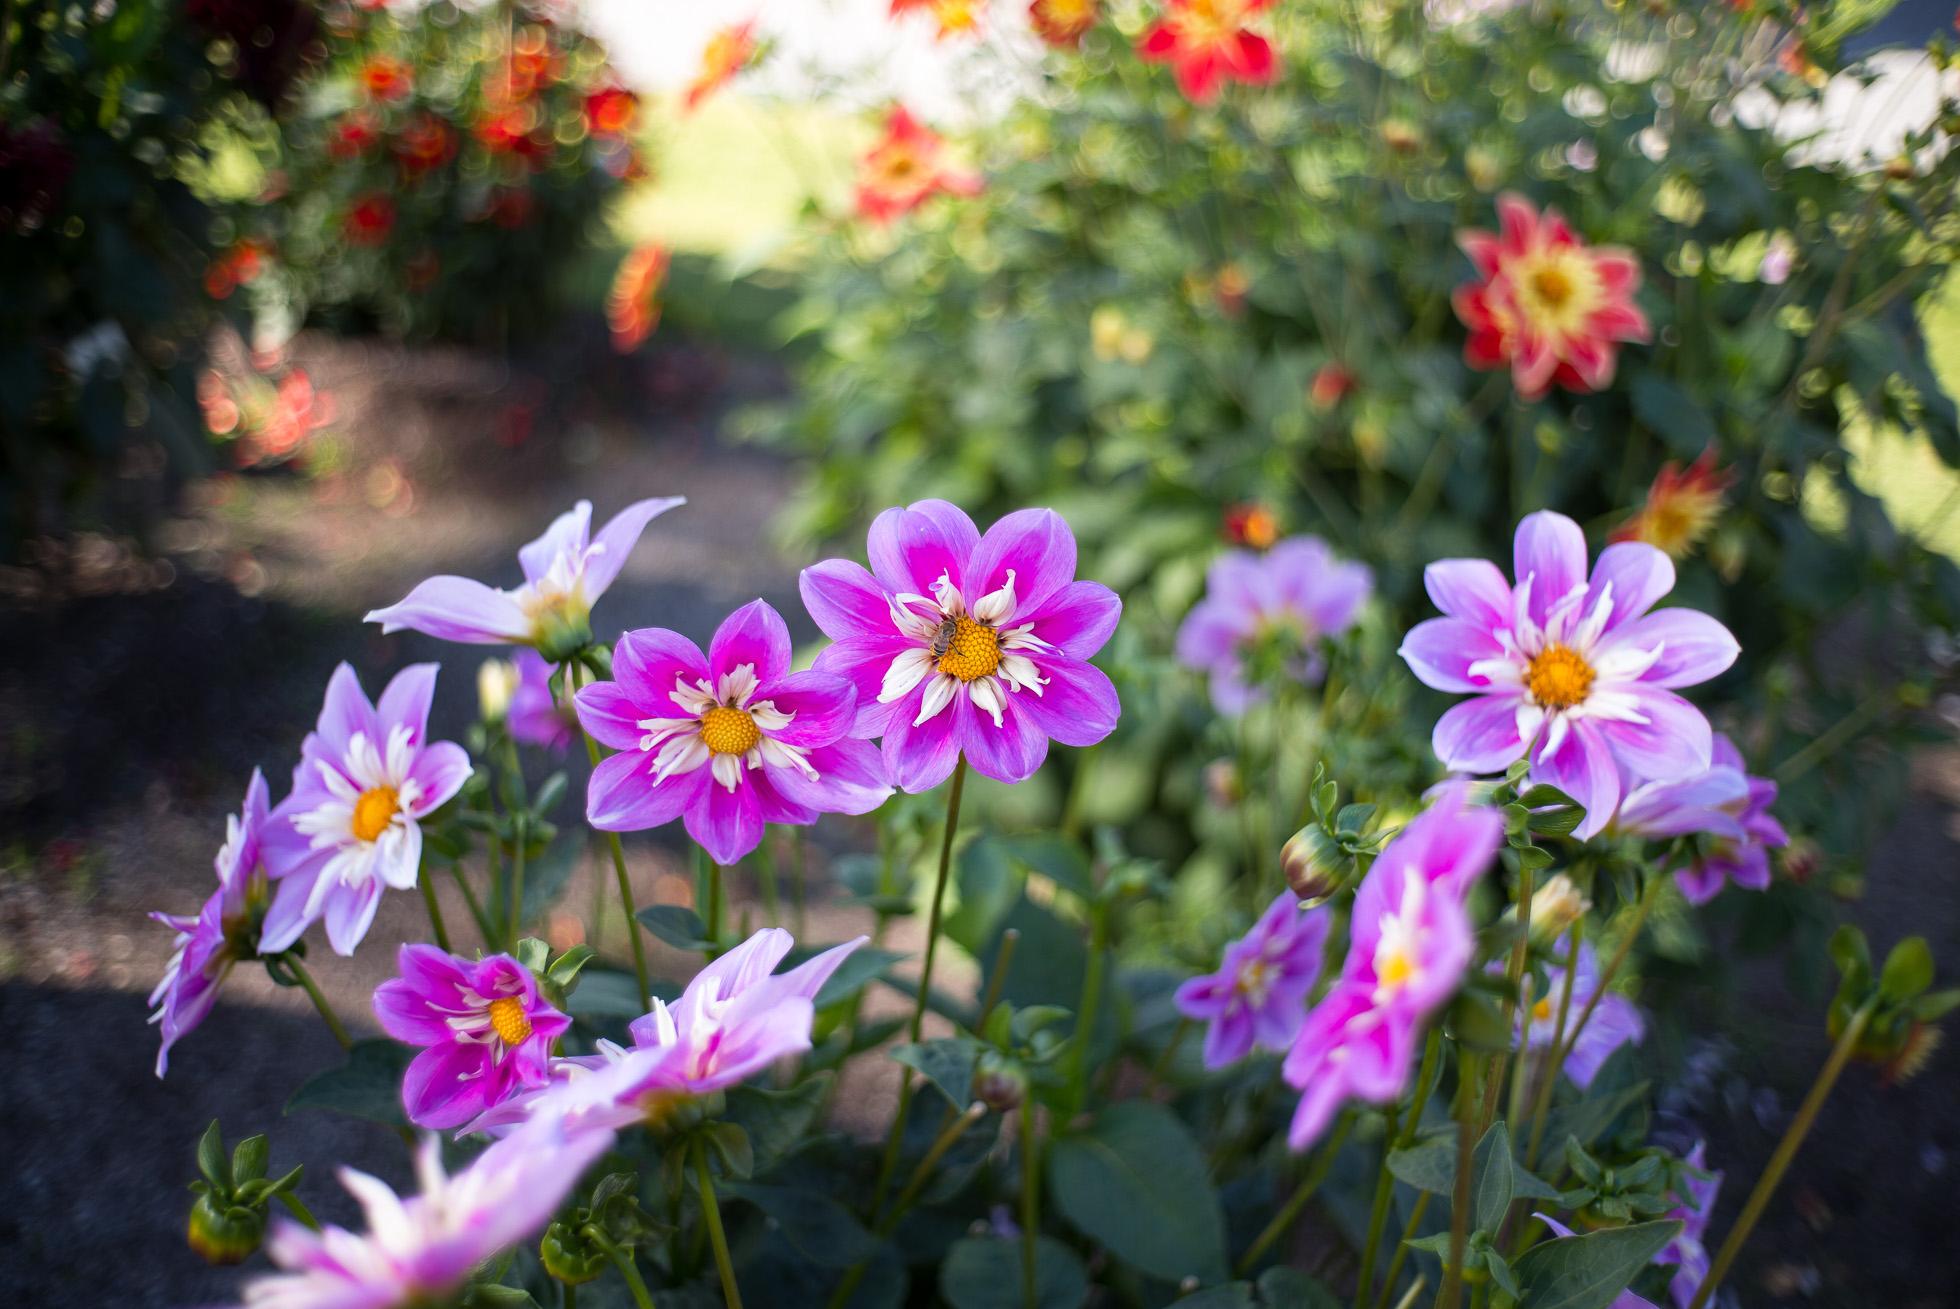 2016-09-18-bergianska-garden_2016-09-18_max-dahlstrand_0015